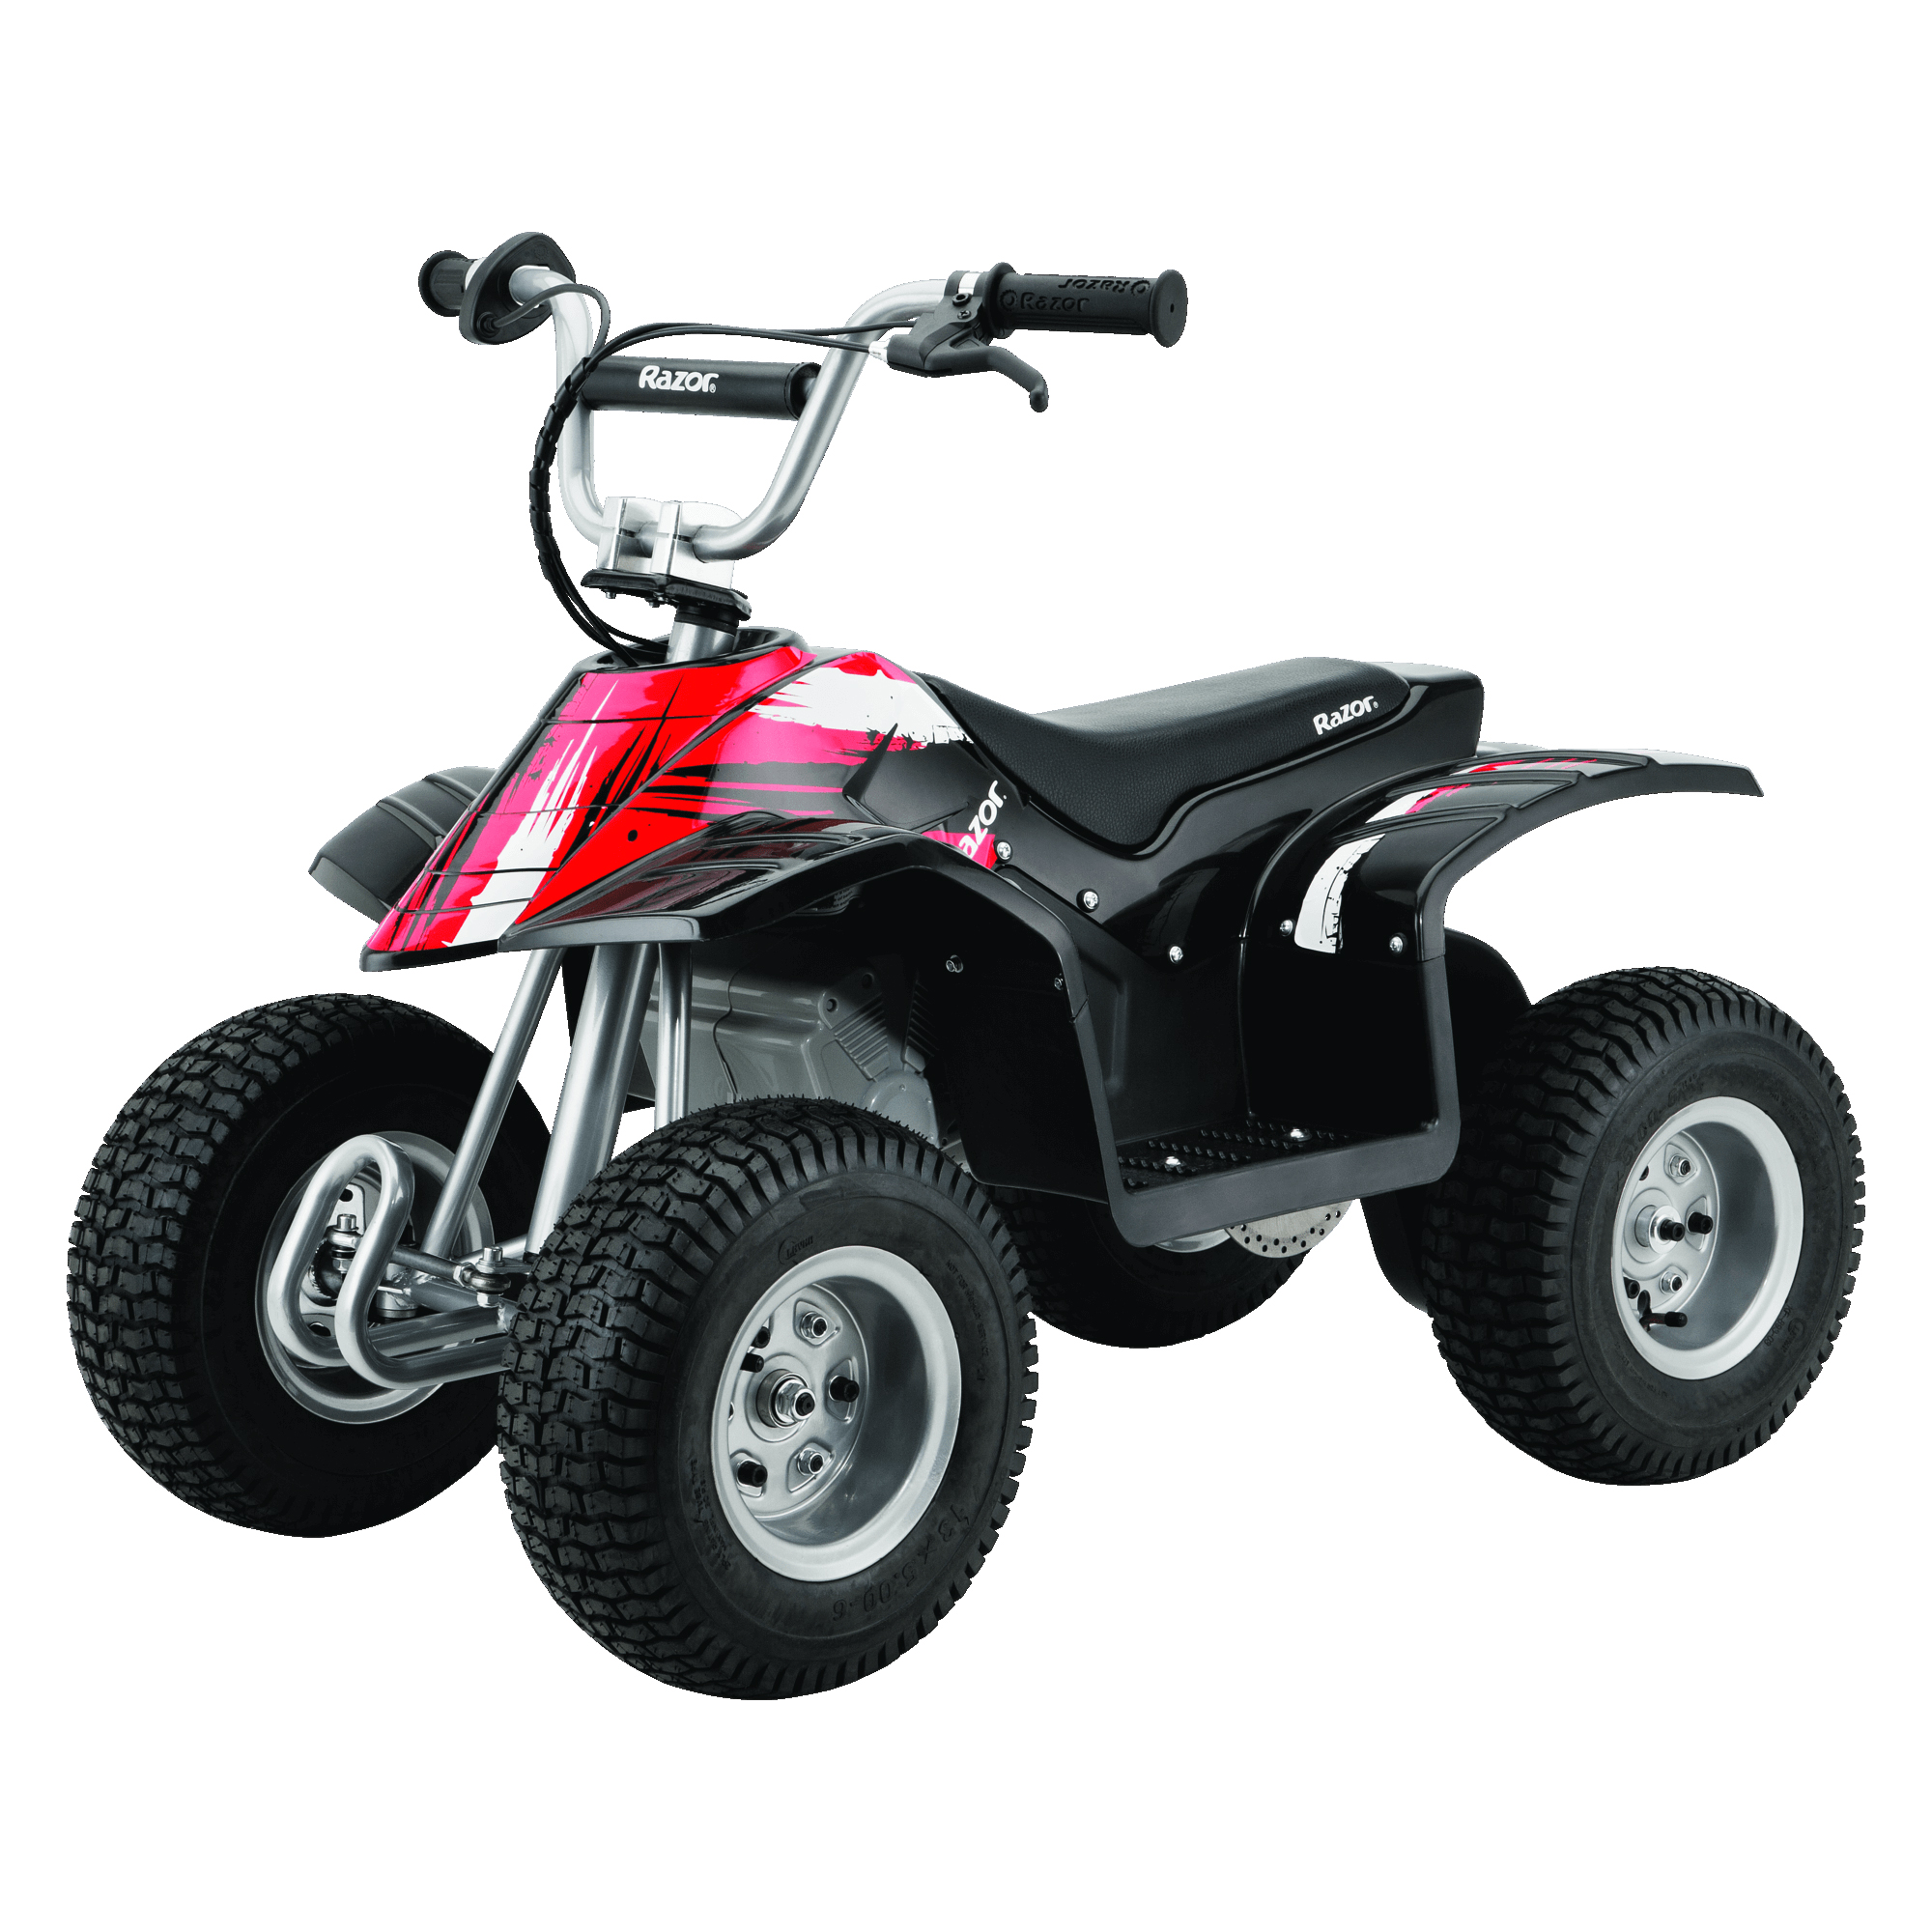 hight resolution of razor dirt quad atv parts razor models razor scooter parts accessories vehicle brands monster scooter parts